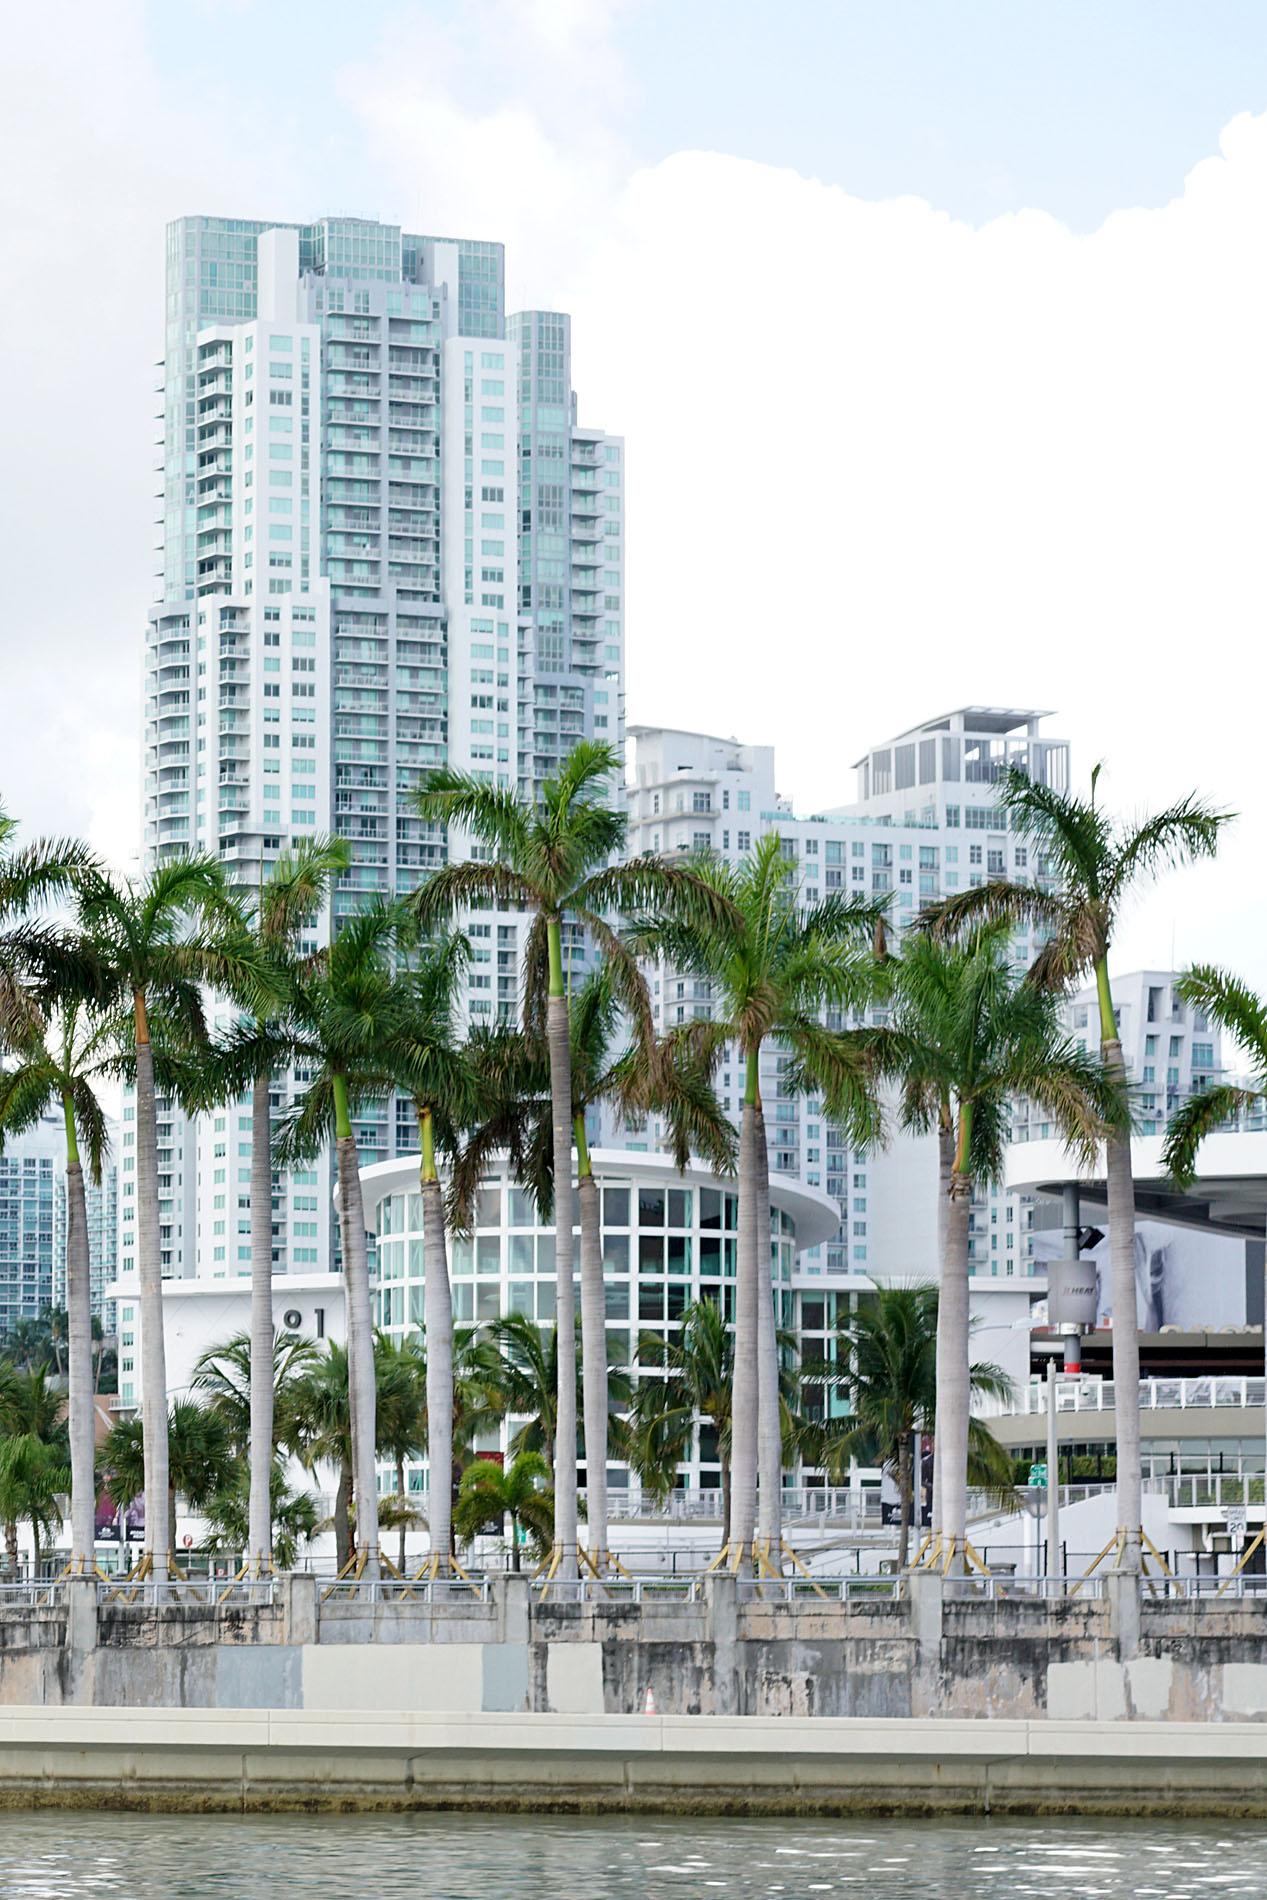 Miami Voyages